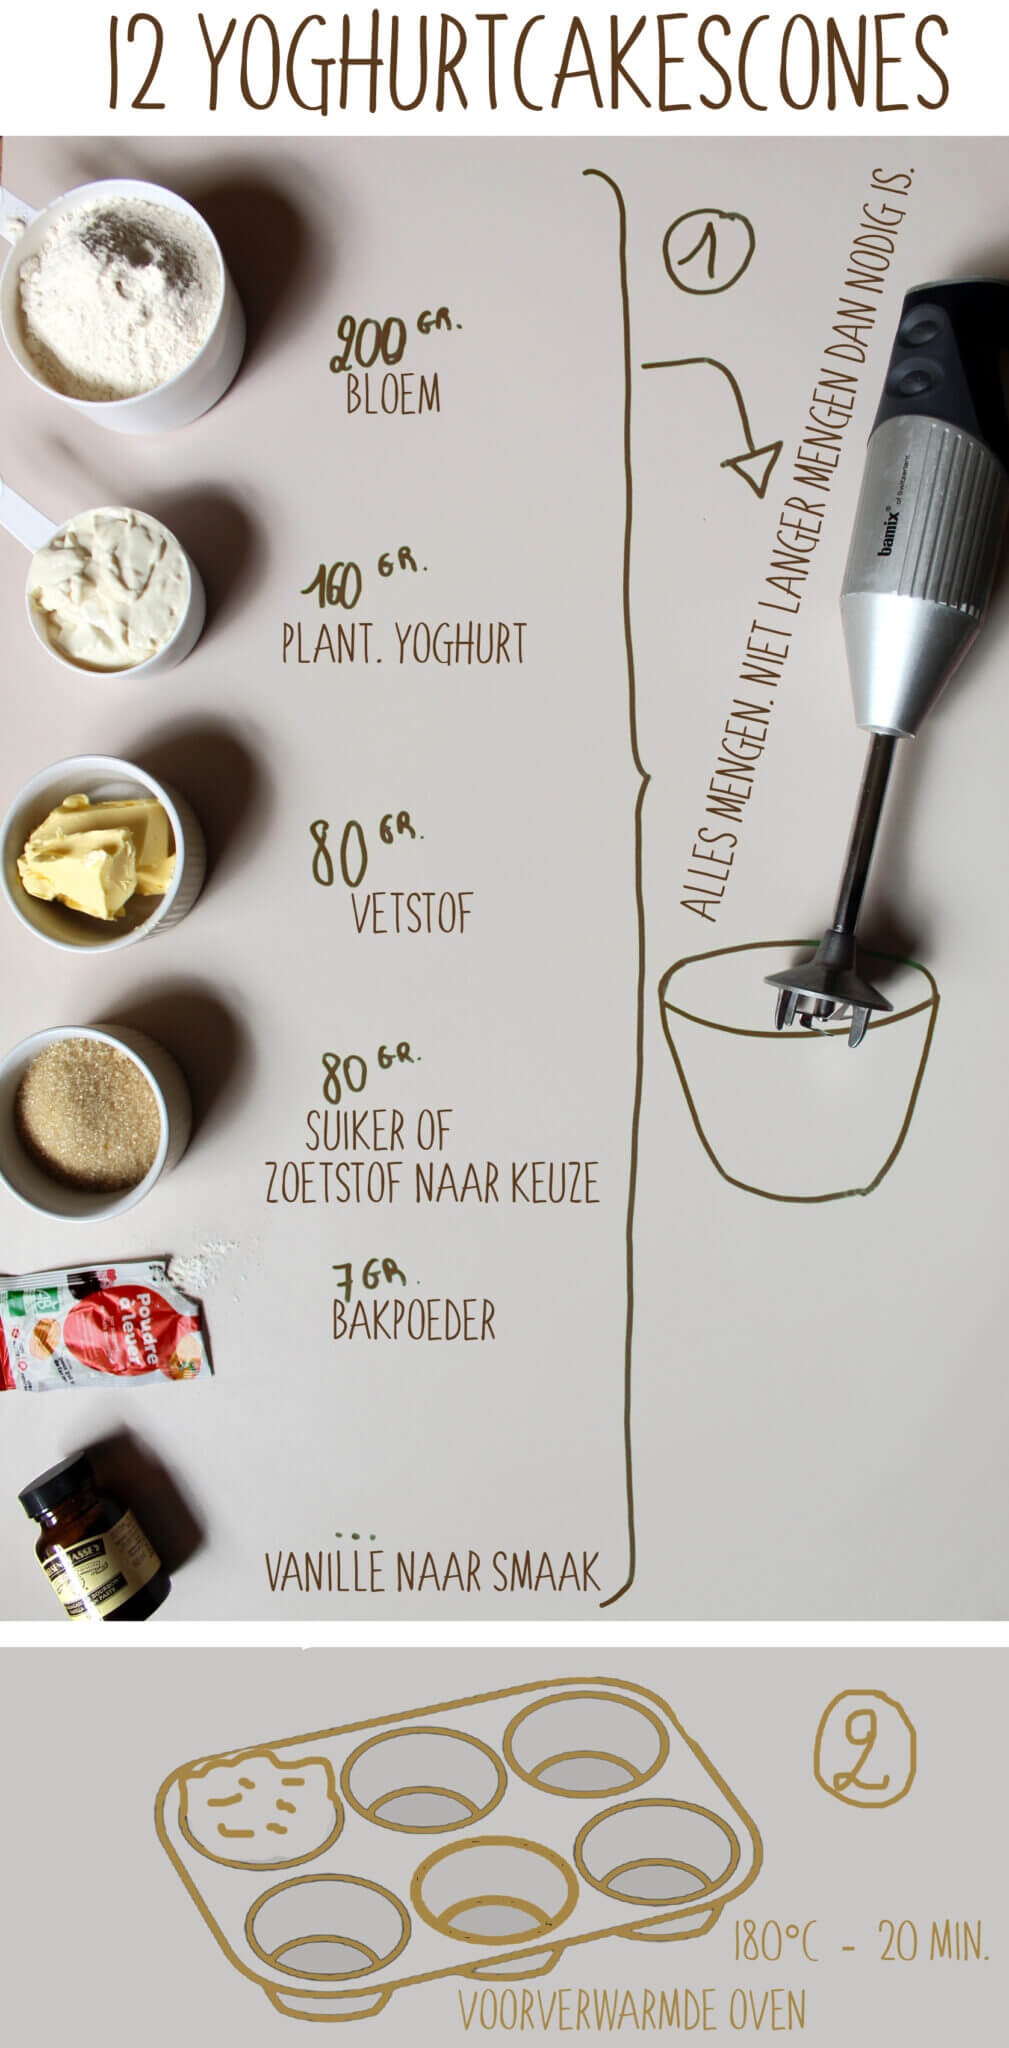 stappenplan yoghurtcakescones.jpg